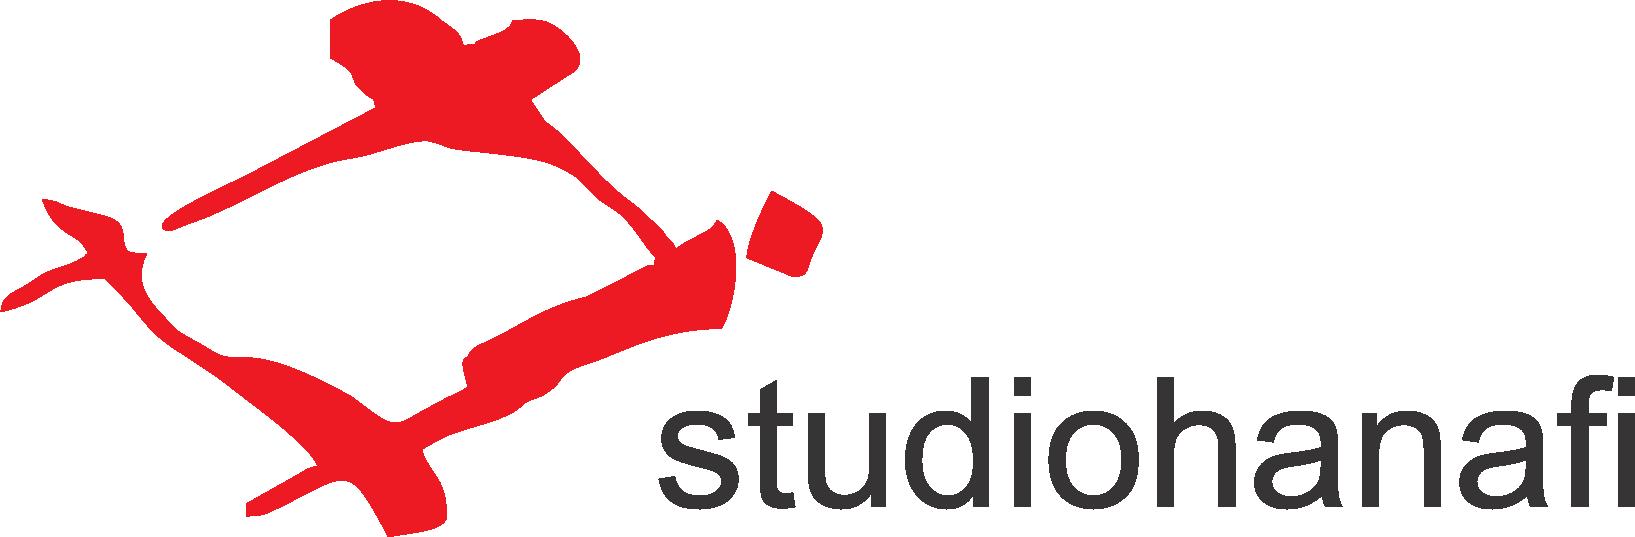 studiohanafi.com